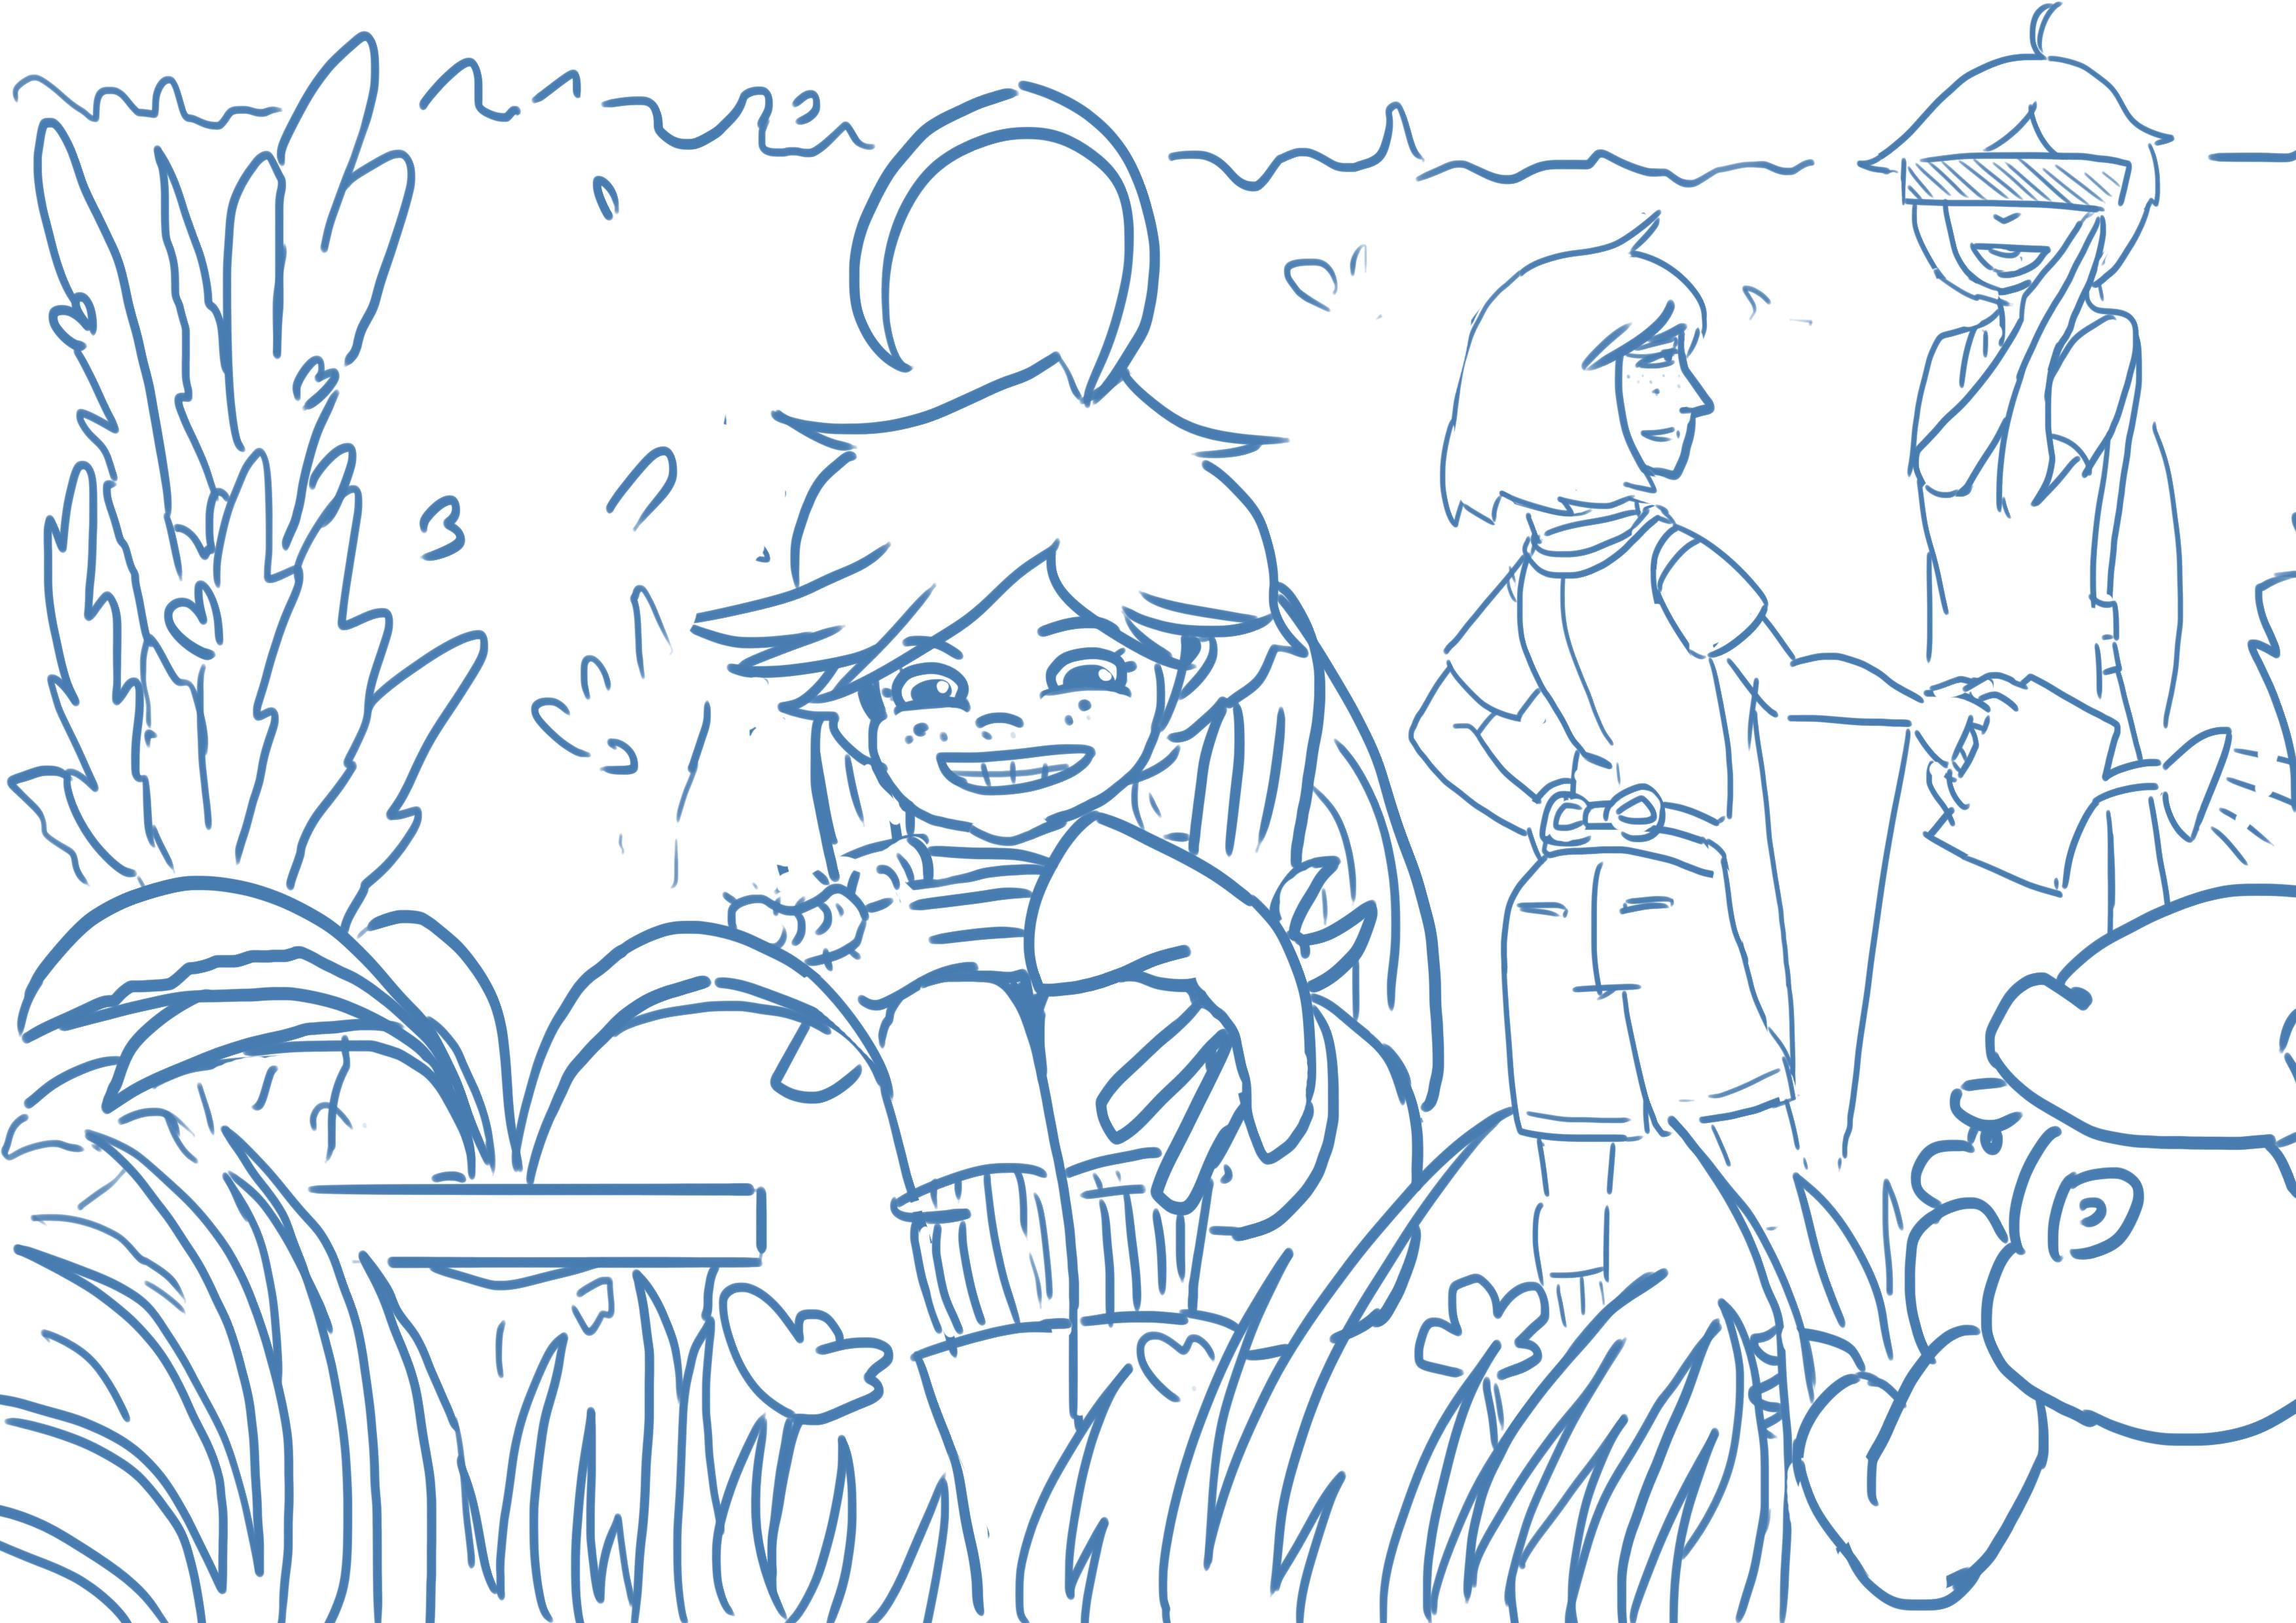 Oktober prompt. Scene study involving murderous gnomes.